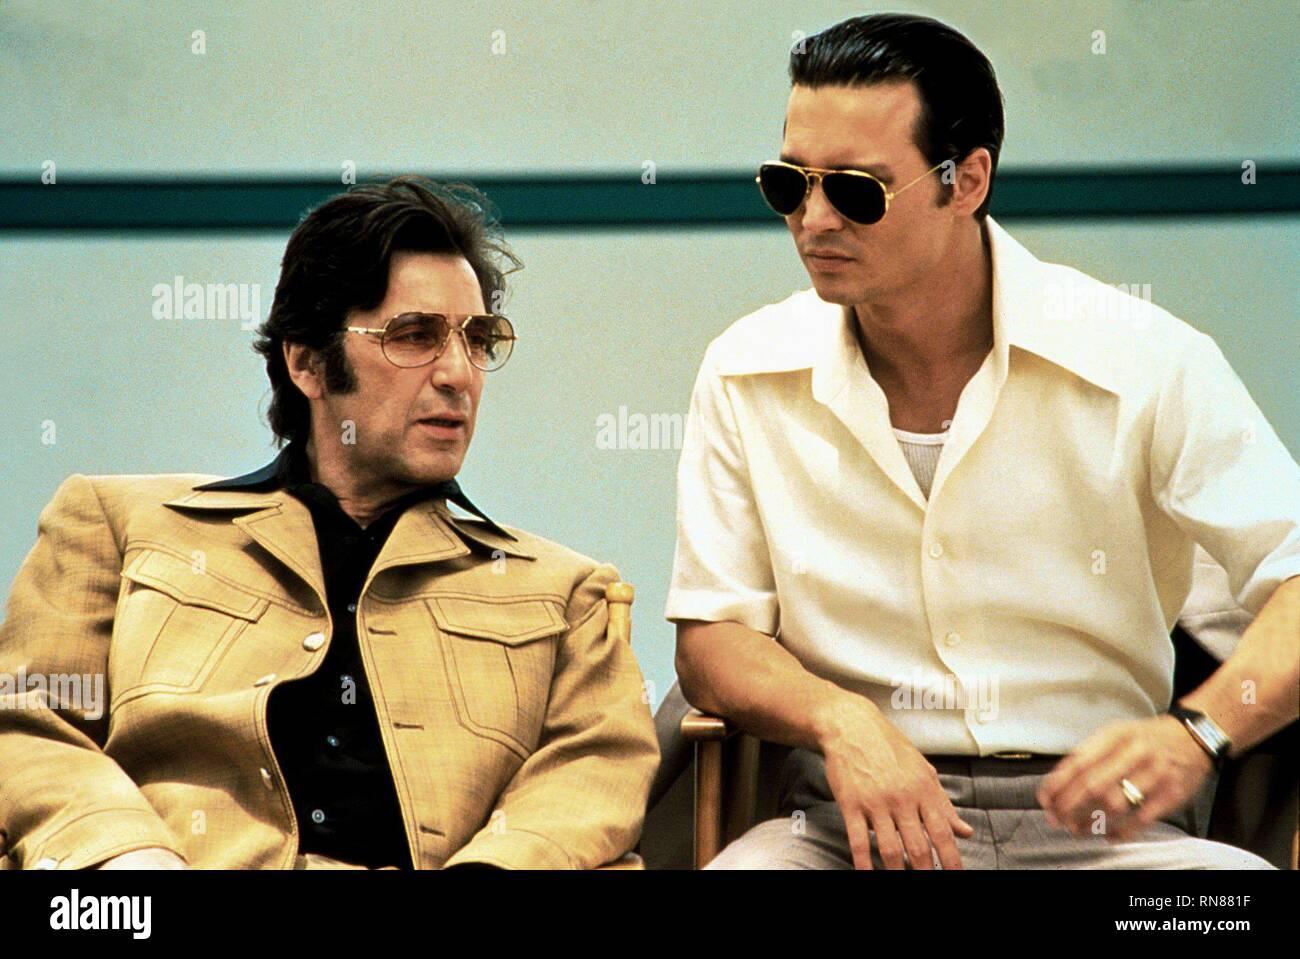 PACINO,DEPP, DONNIE BRASCO, 1997 Stock Photo